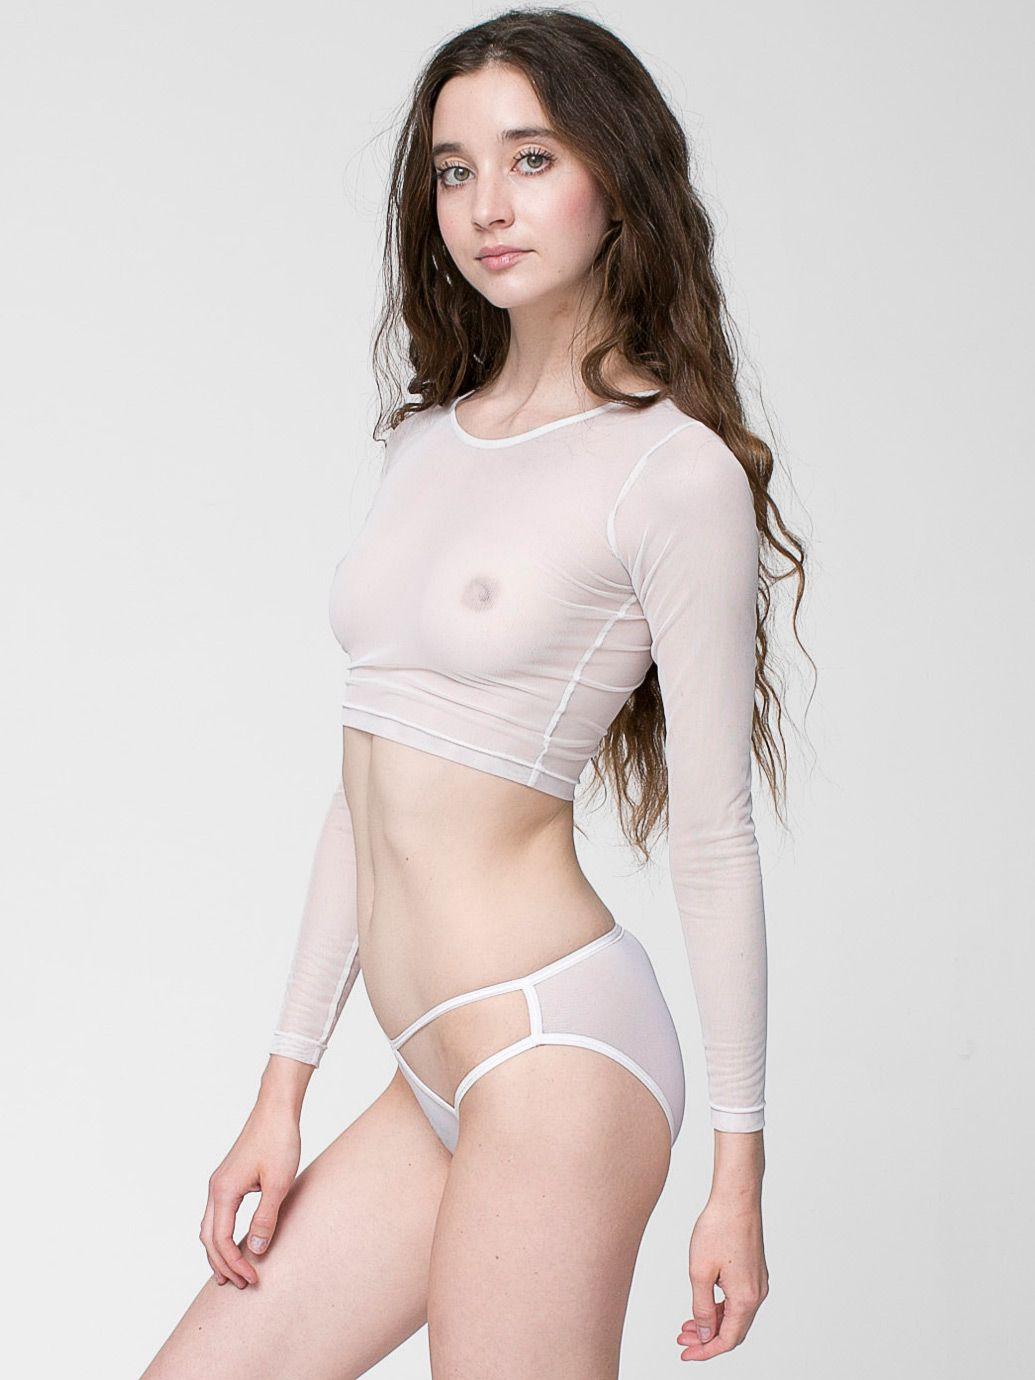 Think, that pretty girls in revealing panties